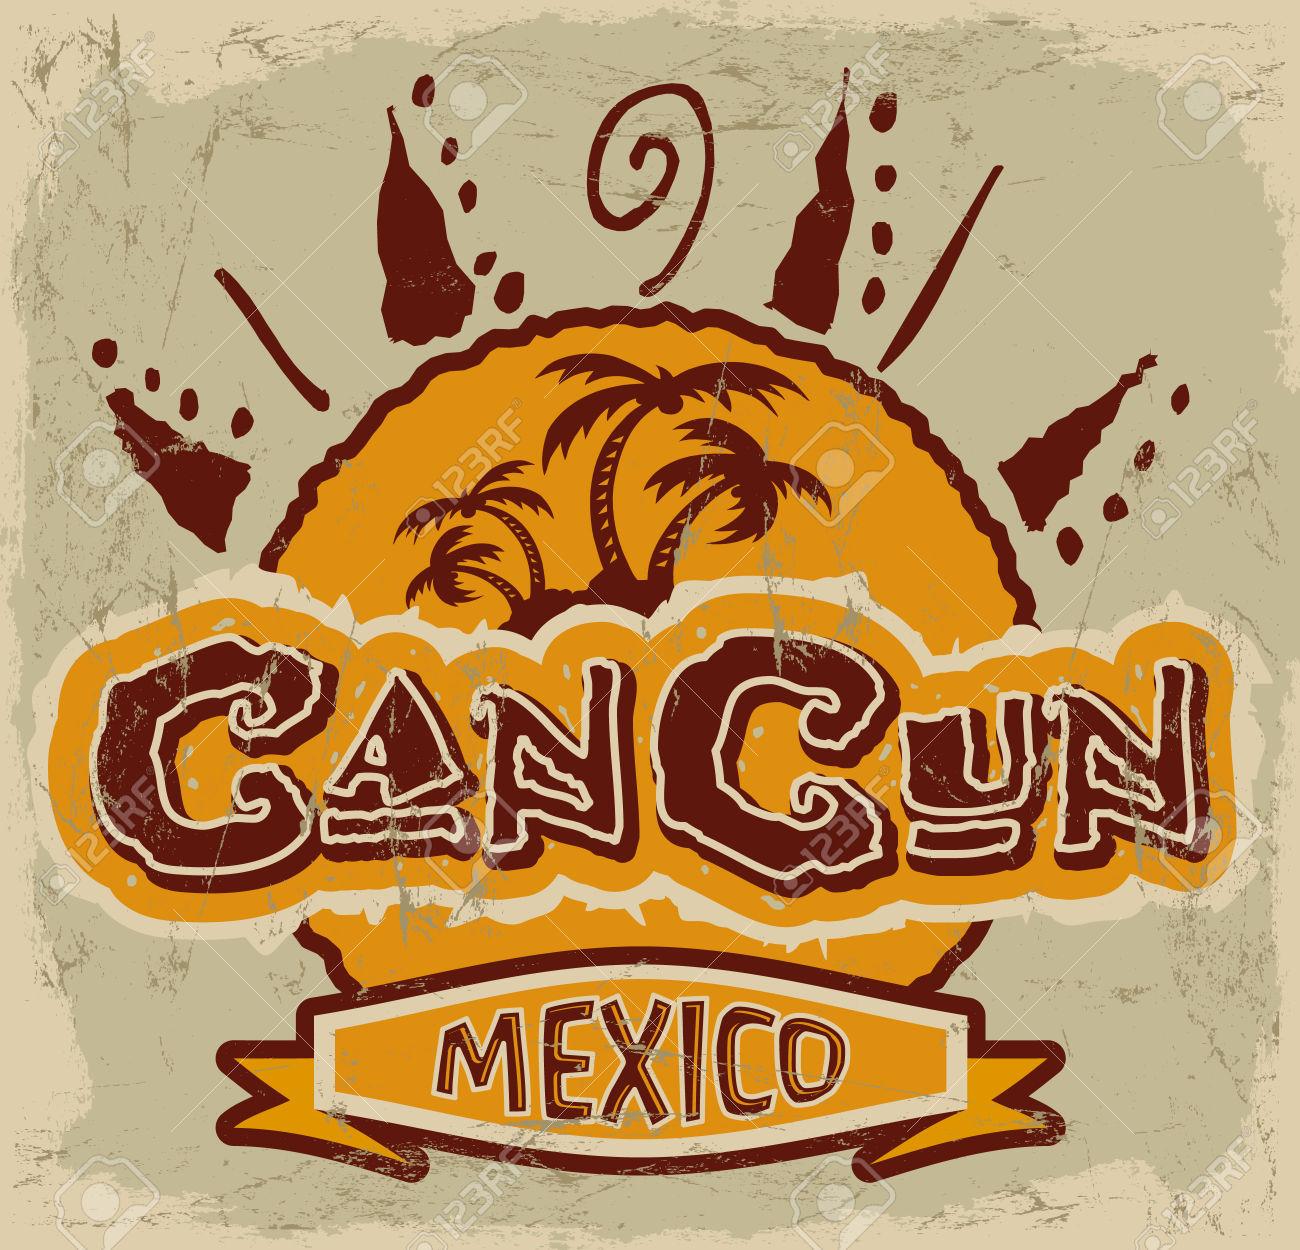 clipart cancun mexico - Clipground